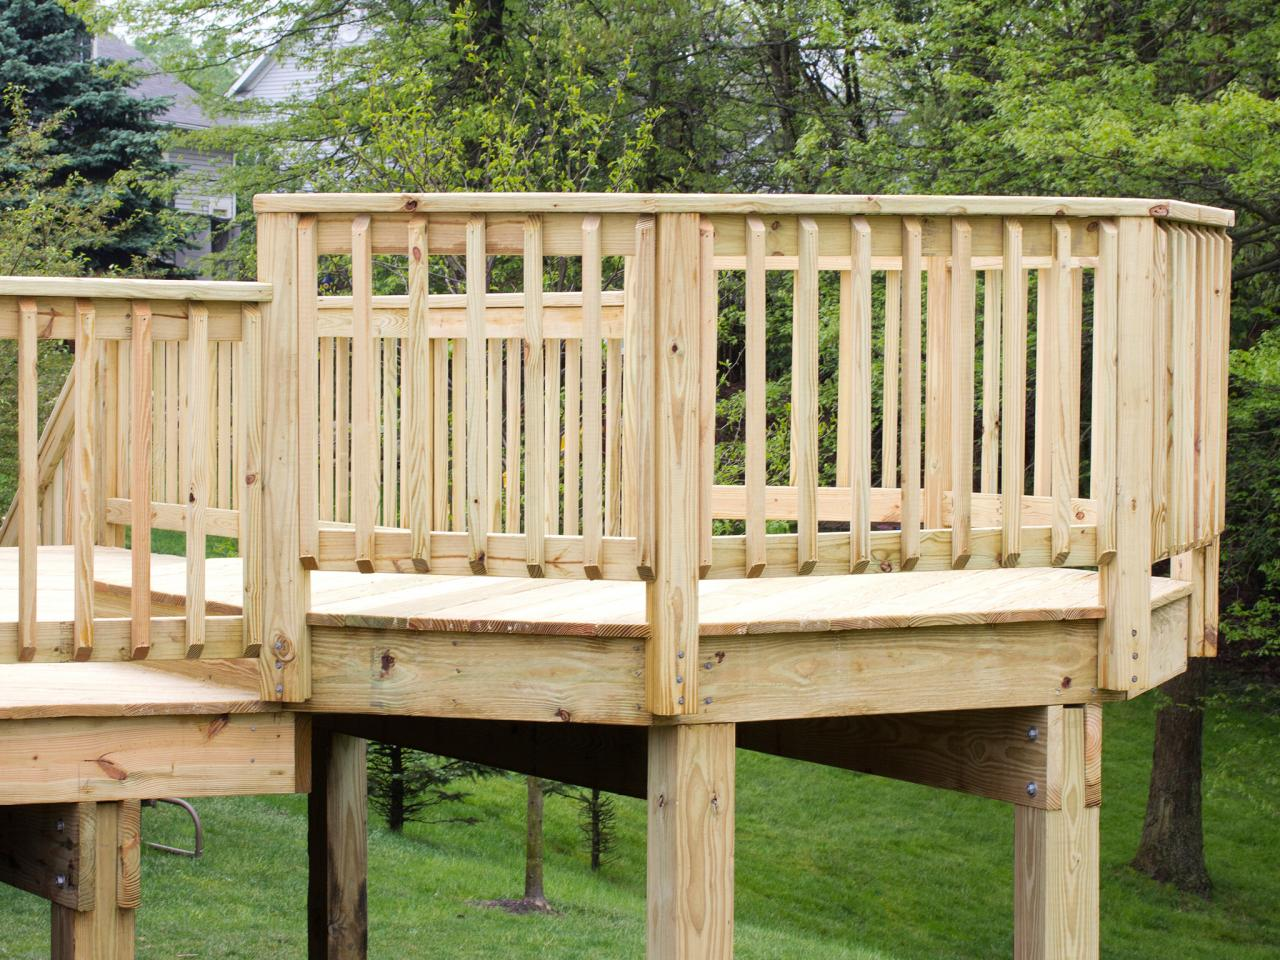 deck railing ideas deck railings: ideas and options KQIJAKL